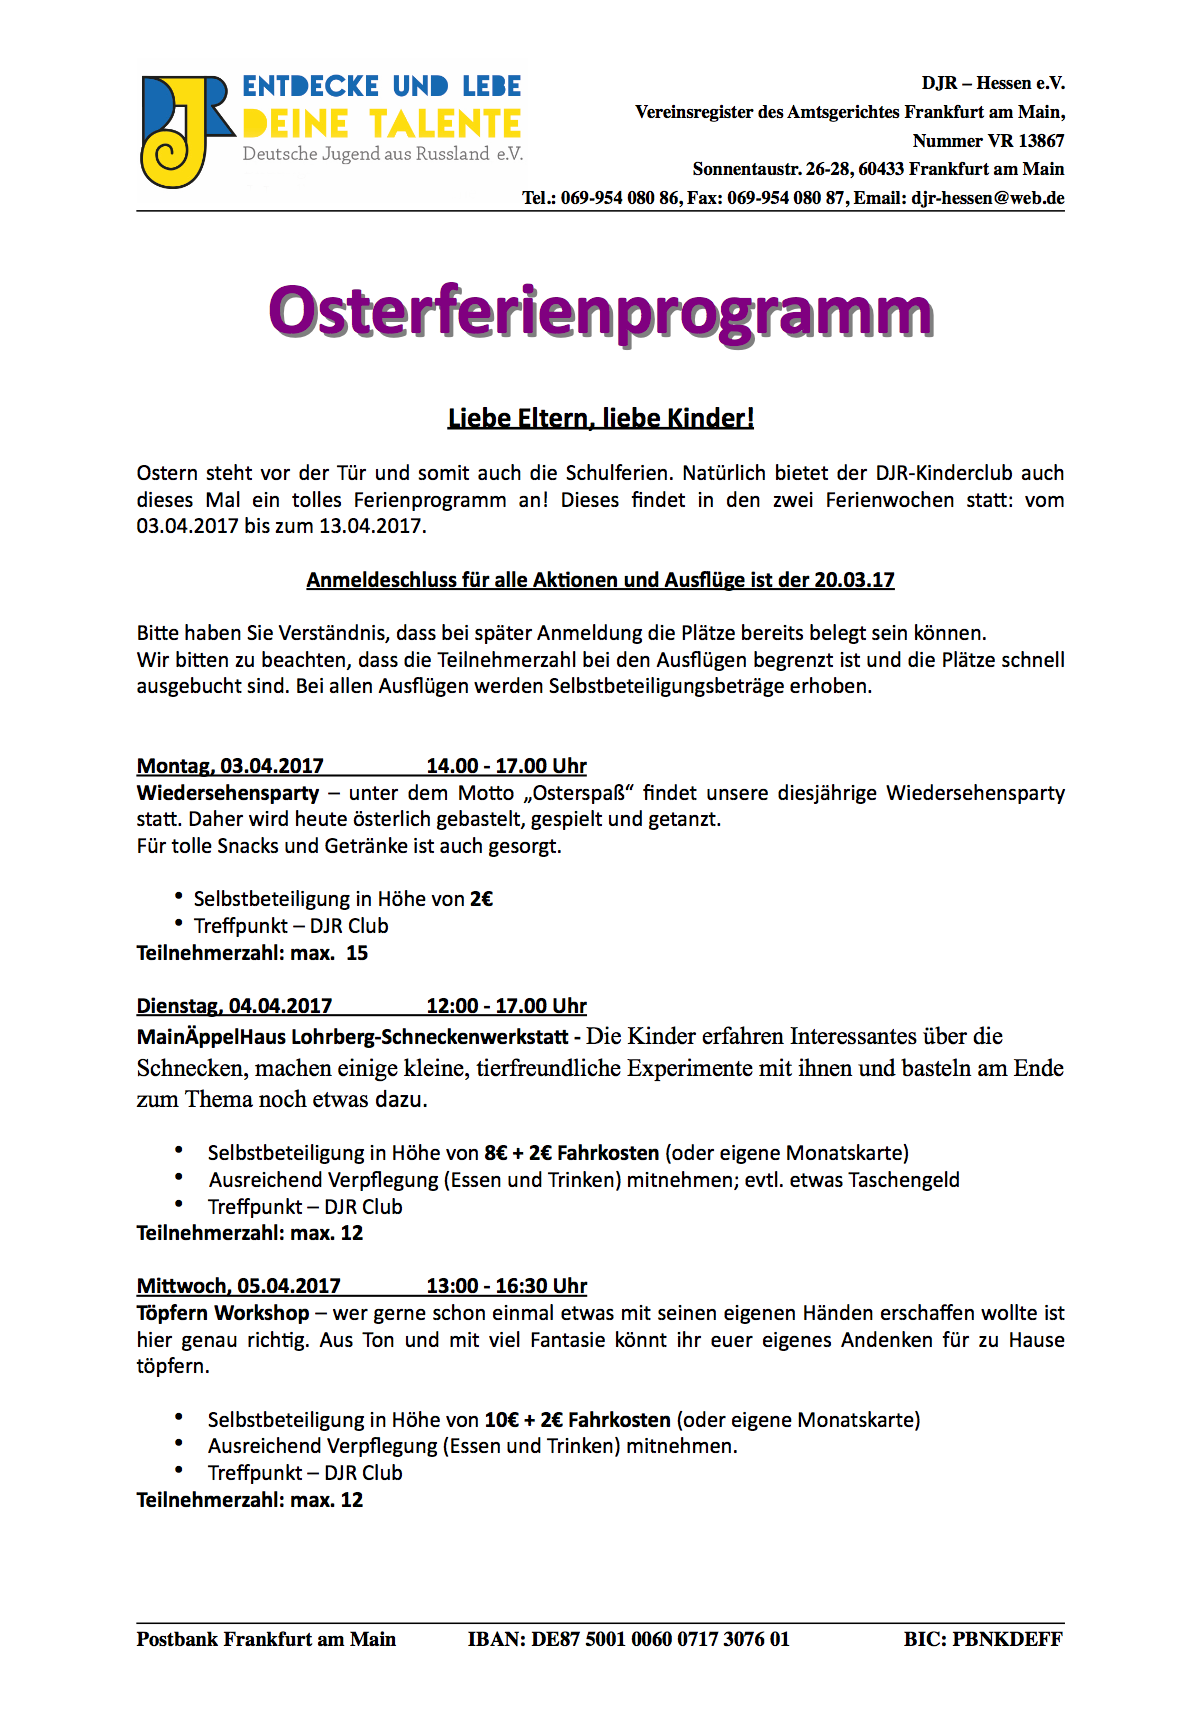 Osterferienprogramm